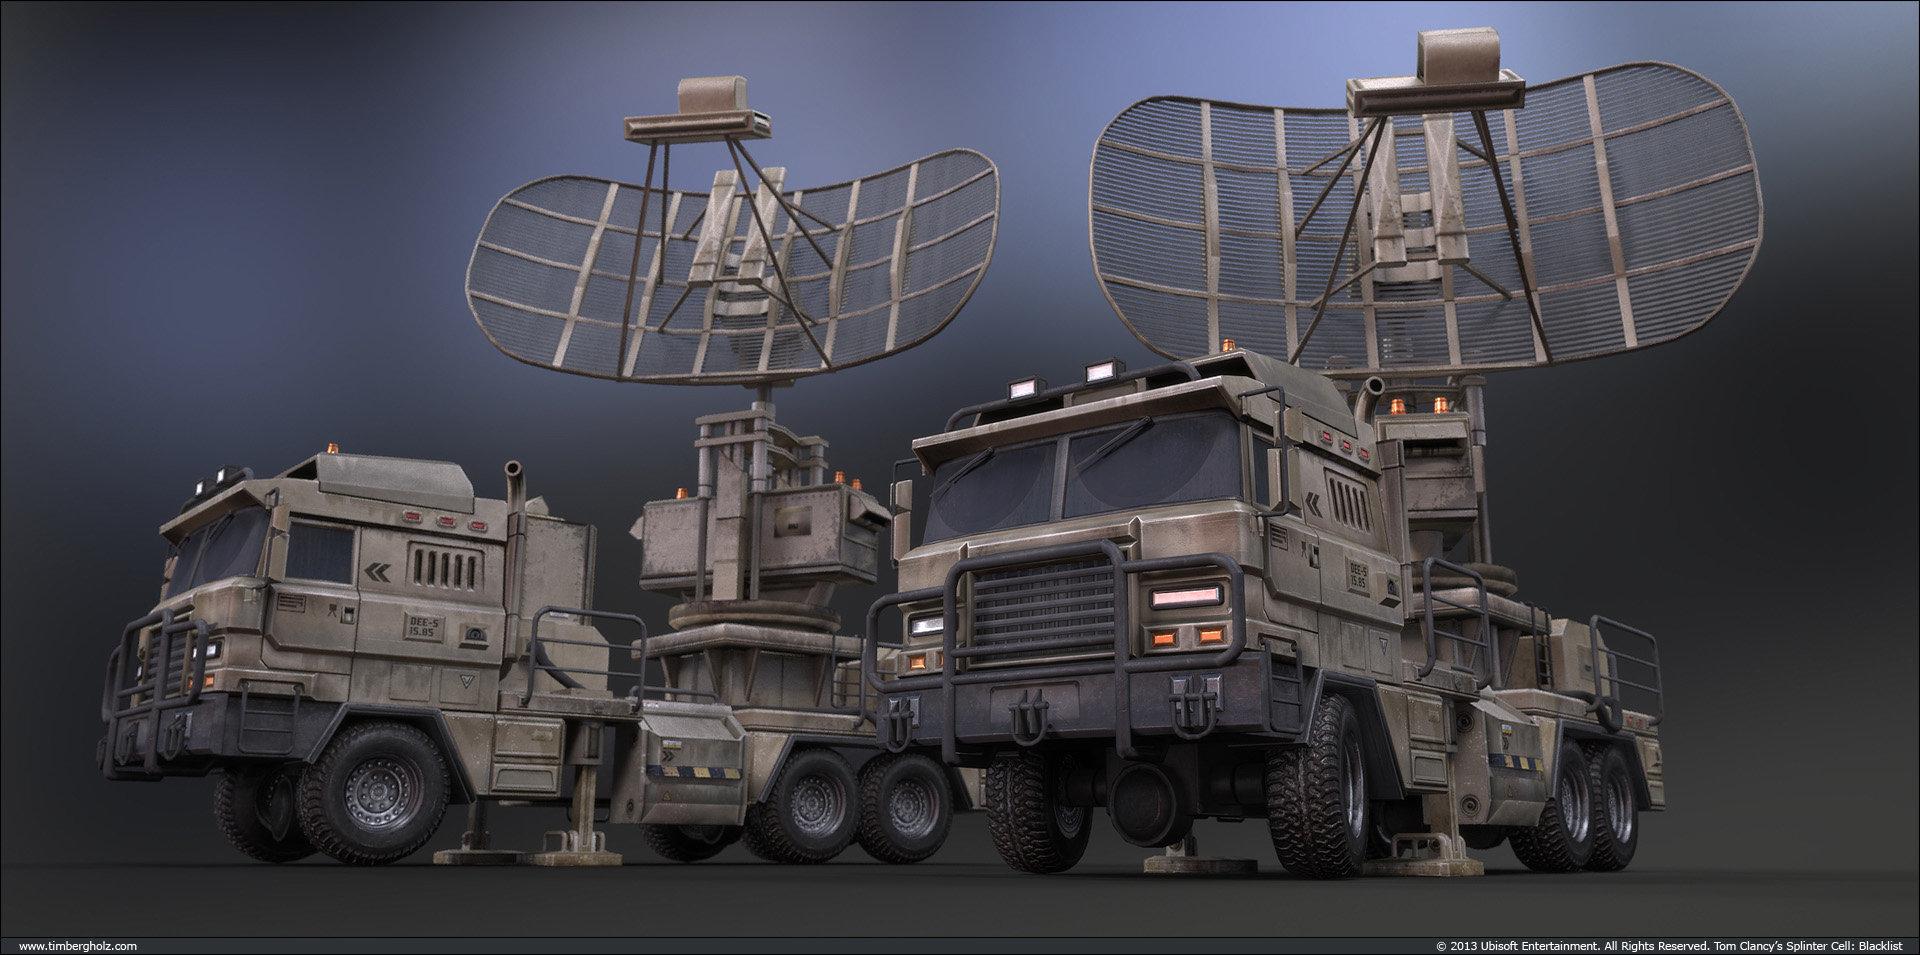 Tim bergholz radar trucks